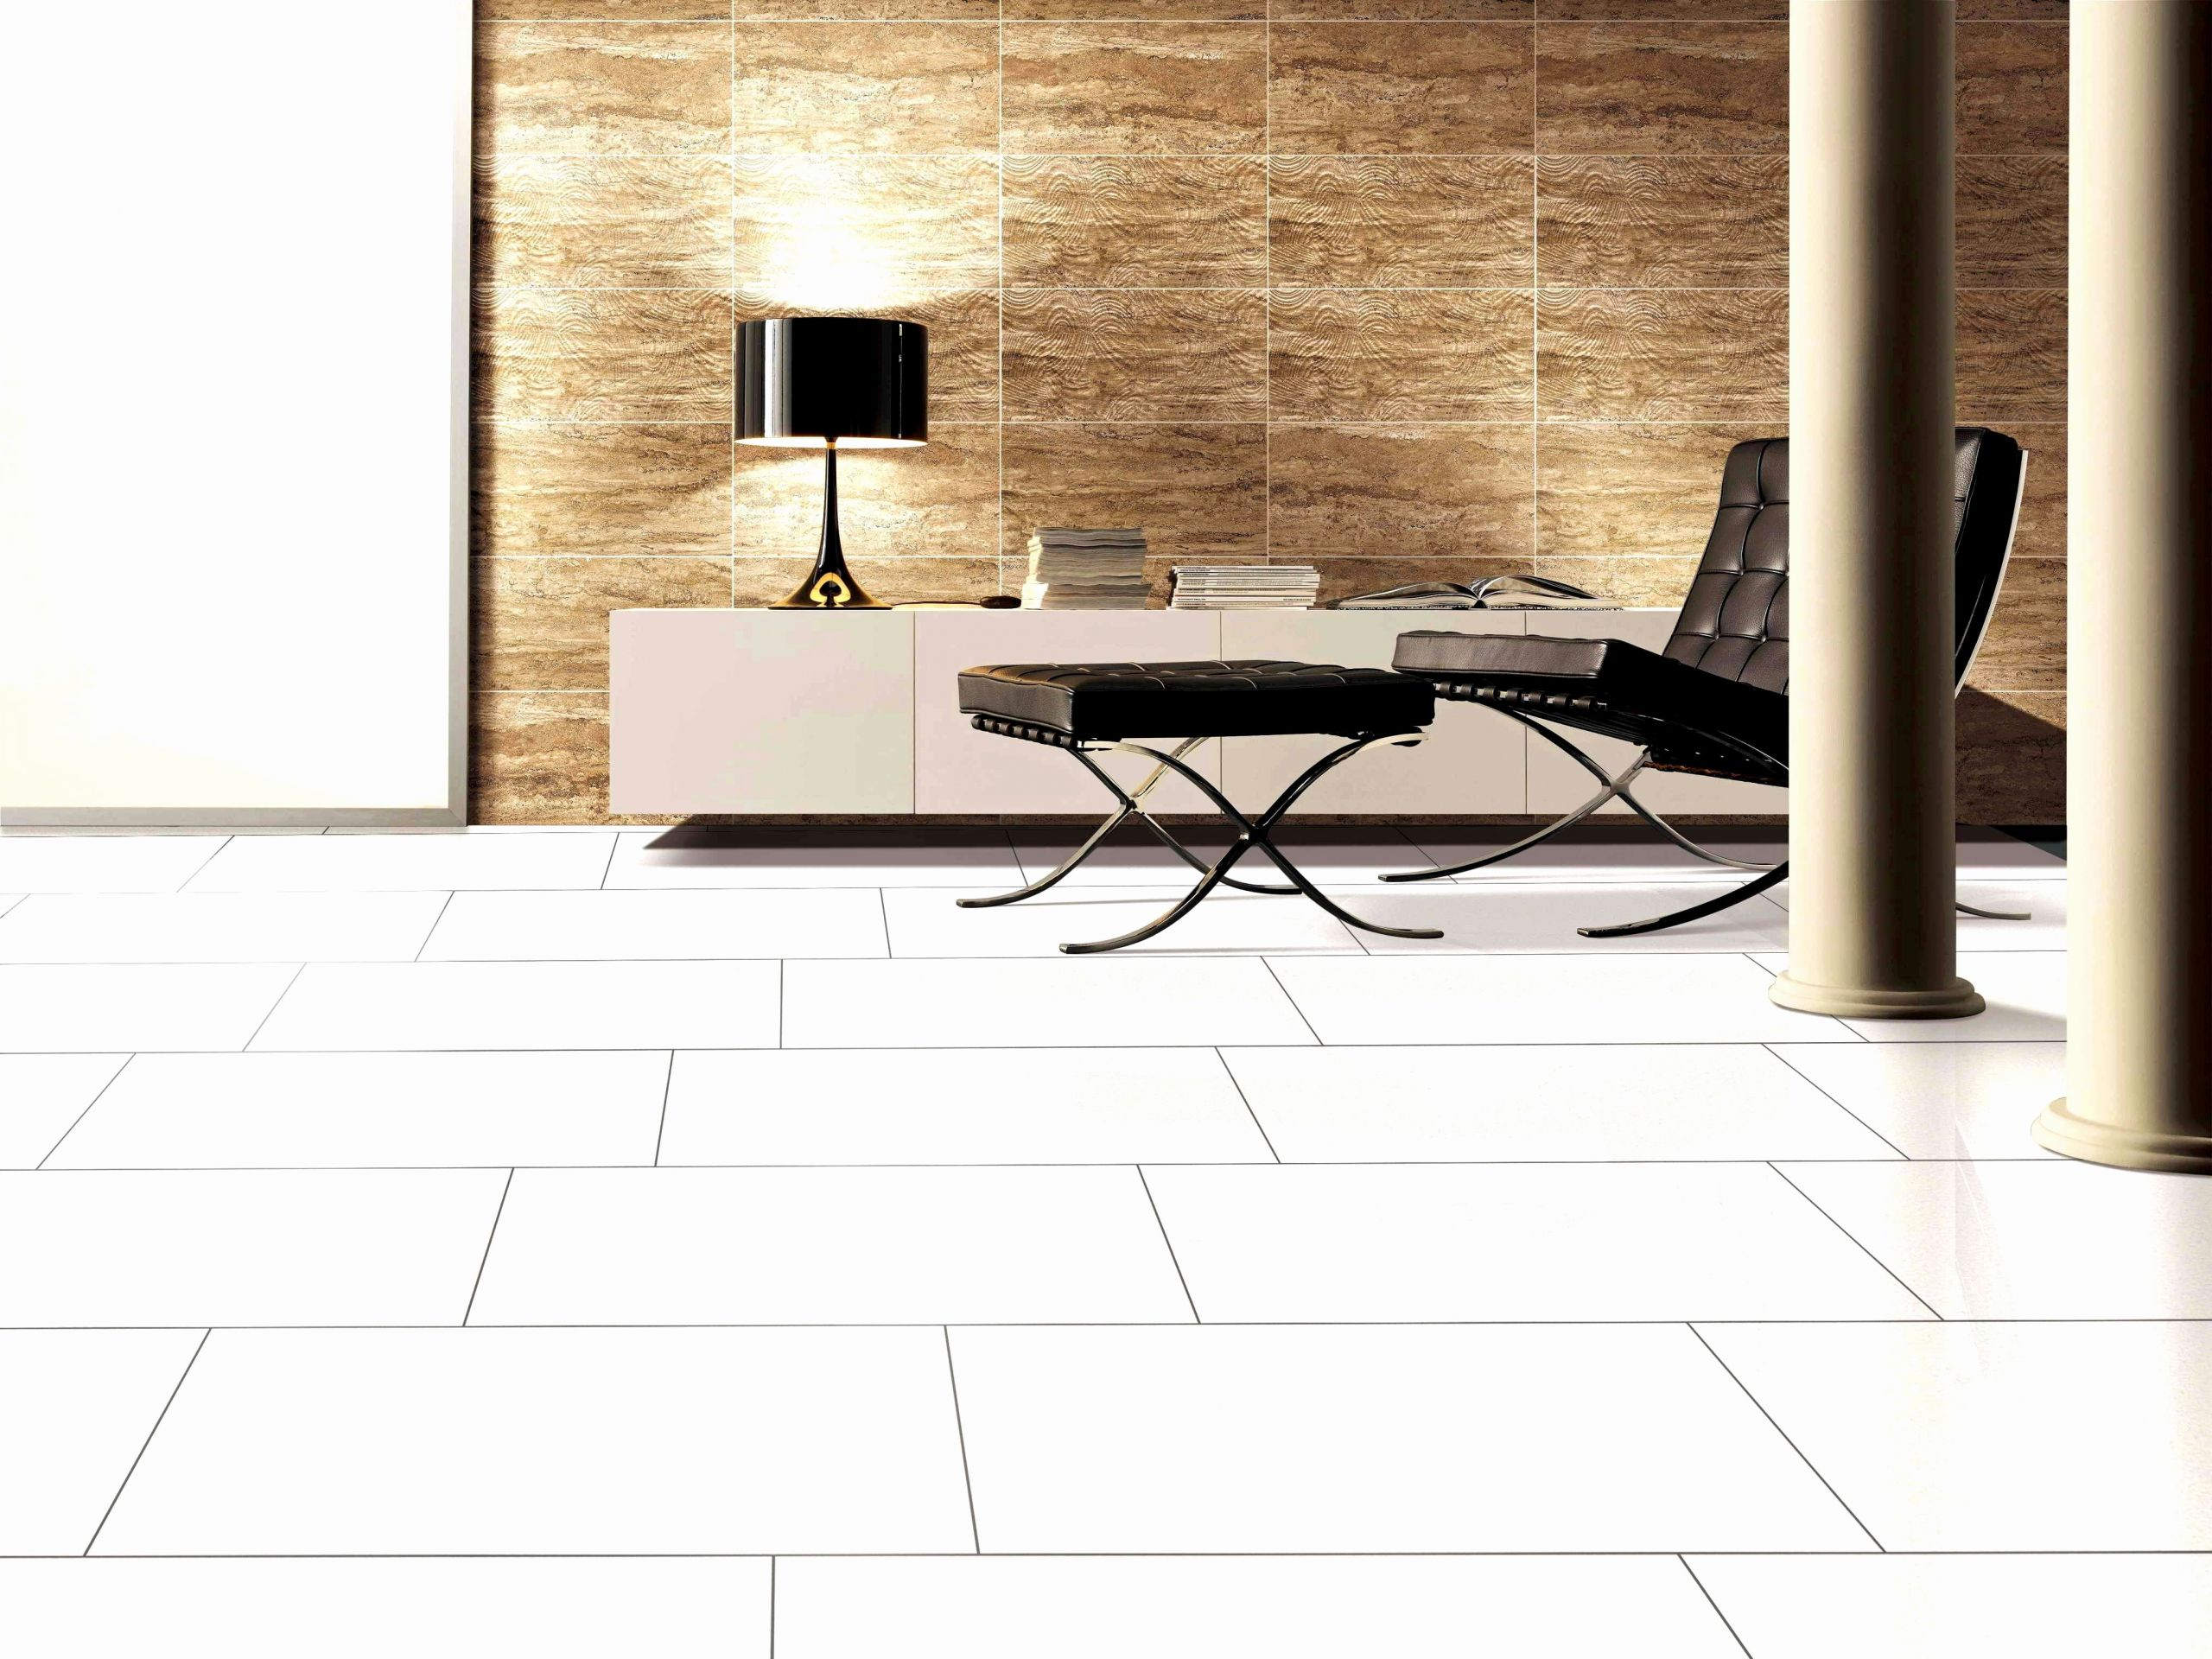 diy hardwood floor cleaner of the wood maker page 5 wood wallpaper inside kitchen and bath tile luxury new tile floor mosaic bathroom 0d new ideas of wood floors